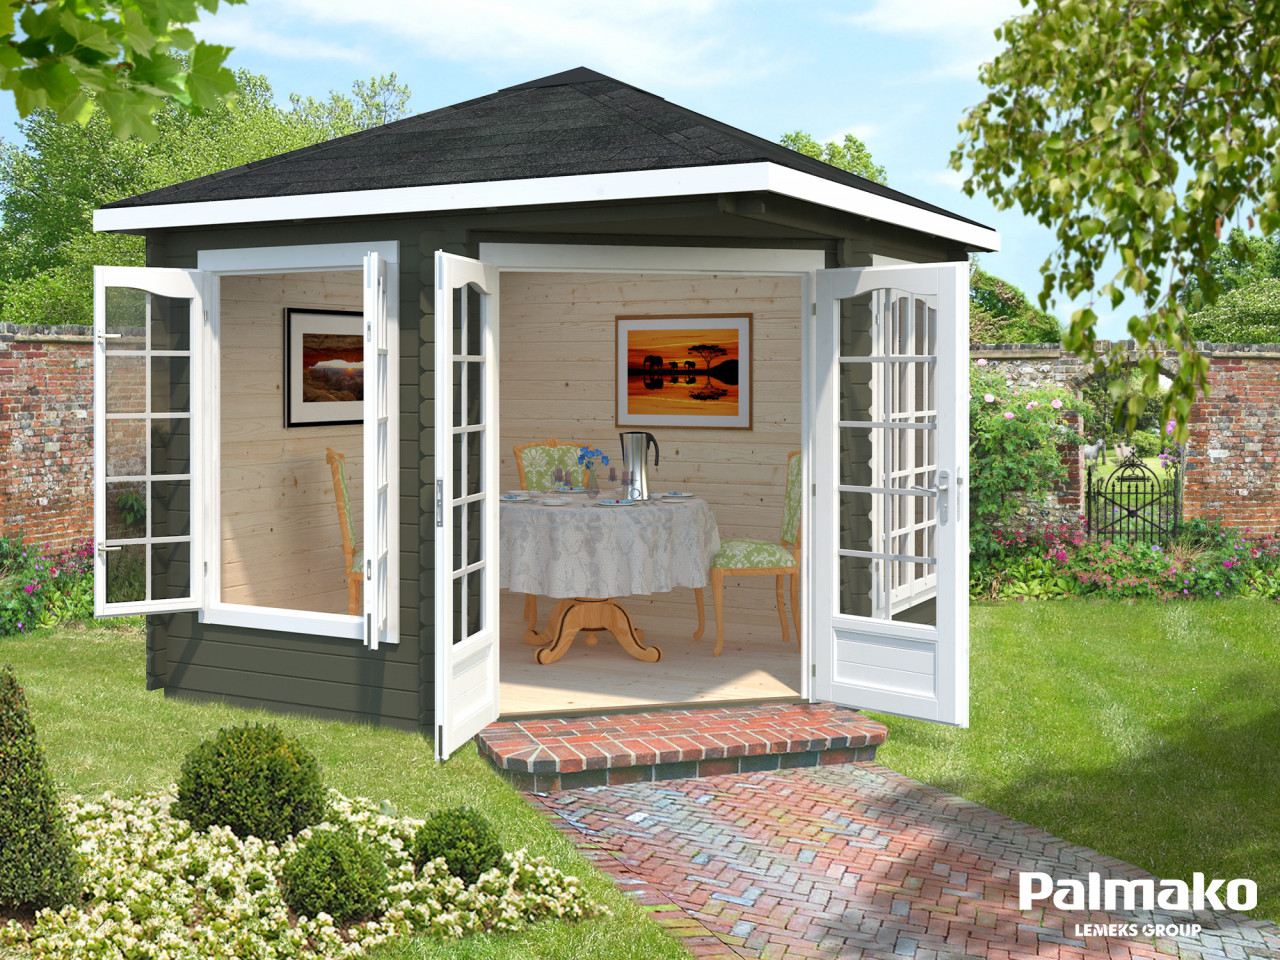 Palmako 5 Eck Gartenhaus Melanie 6,8 m²